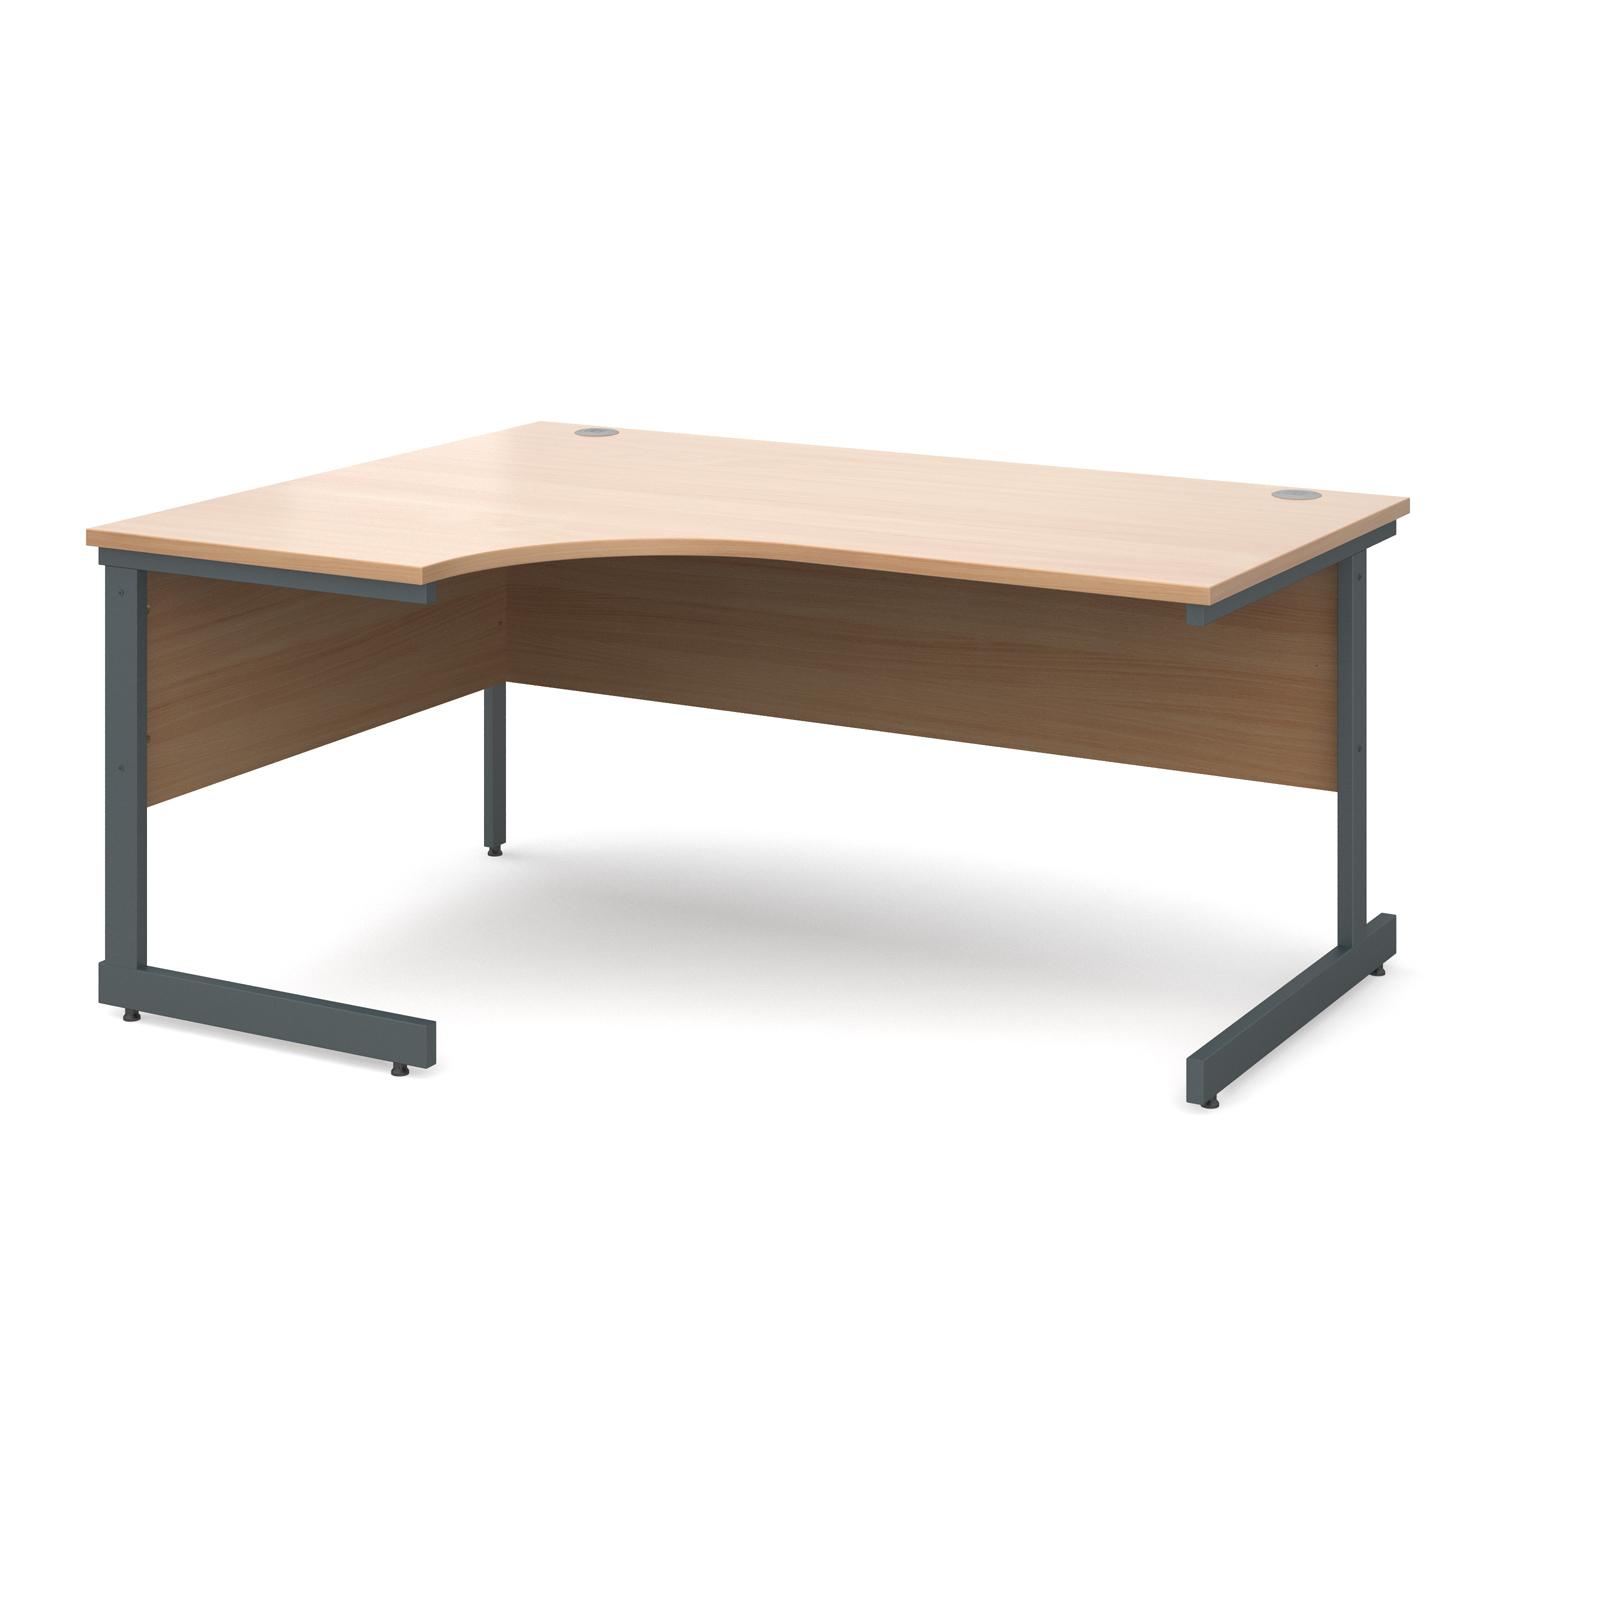 Contract 25 left hand ergonomic desk 1600mm - graphite cantilever frame, beech top